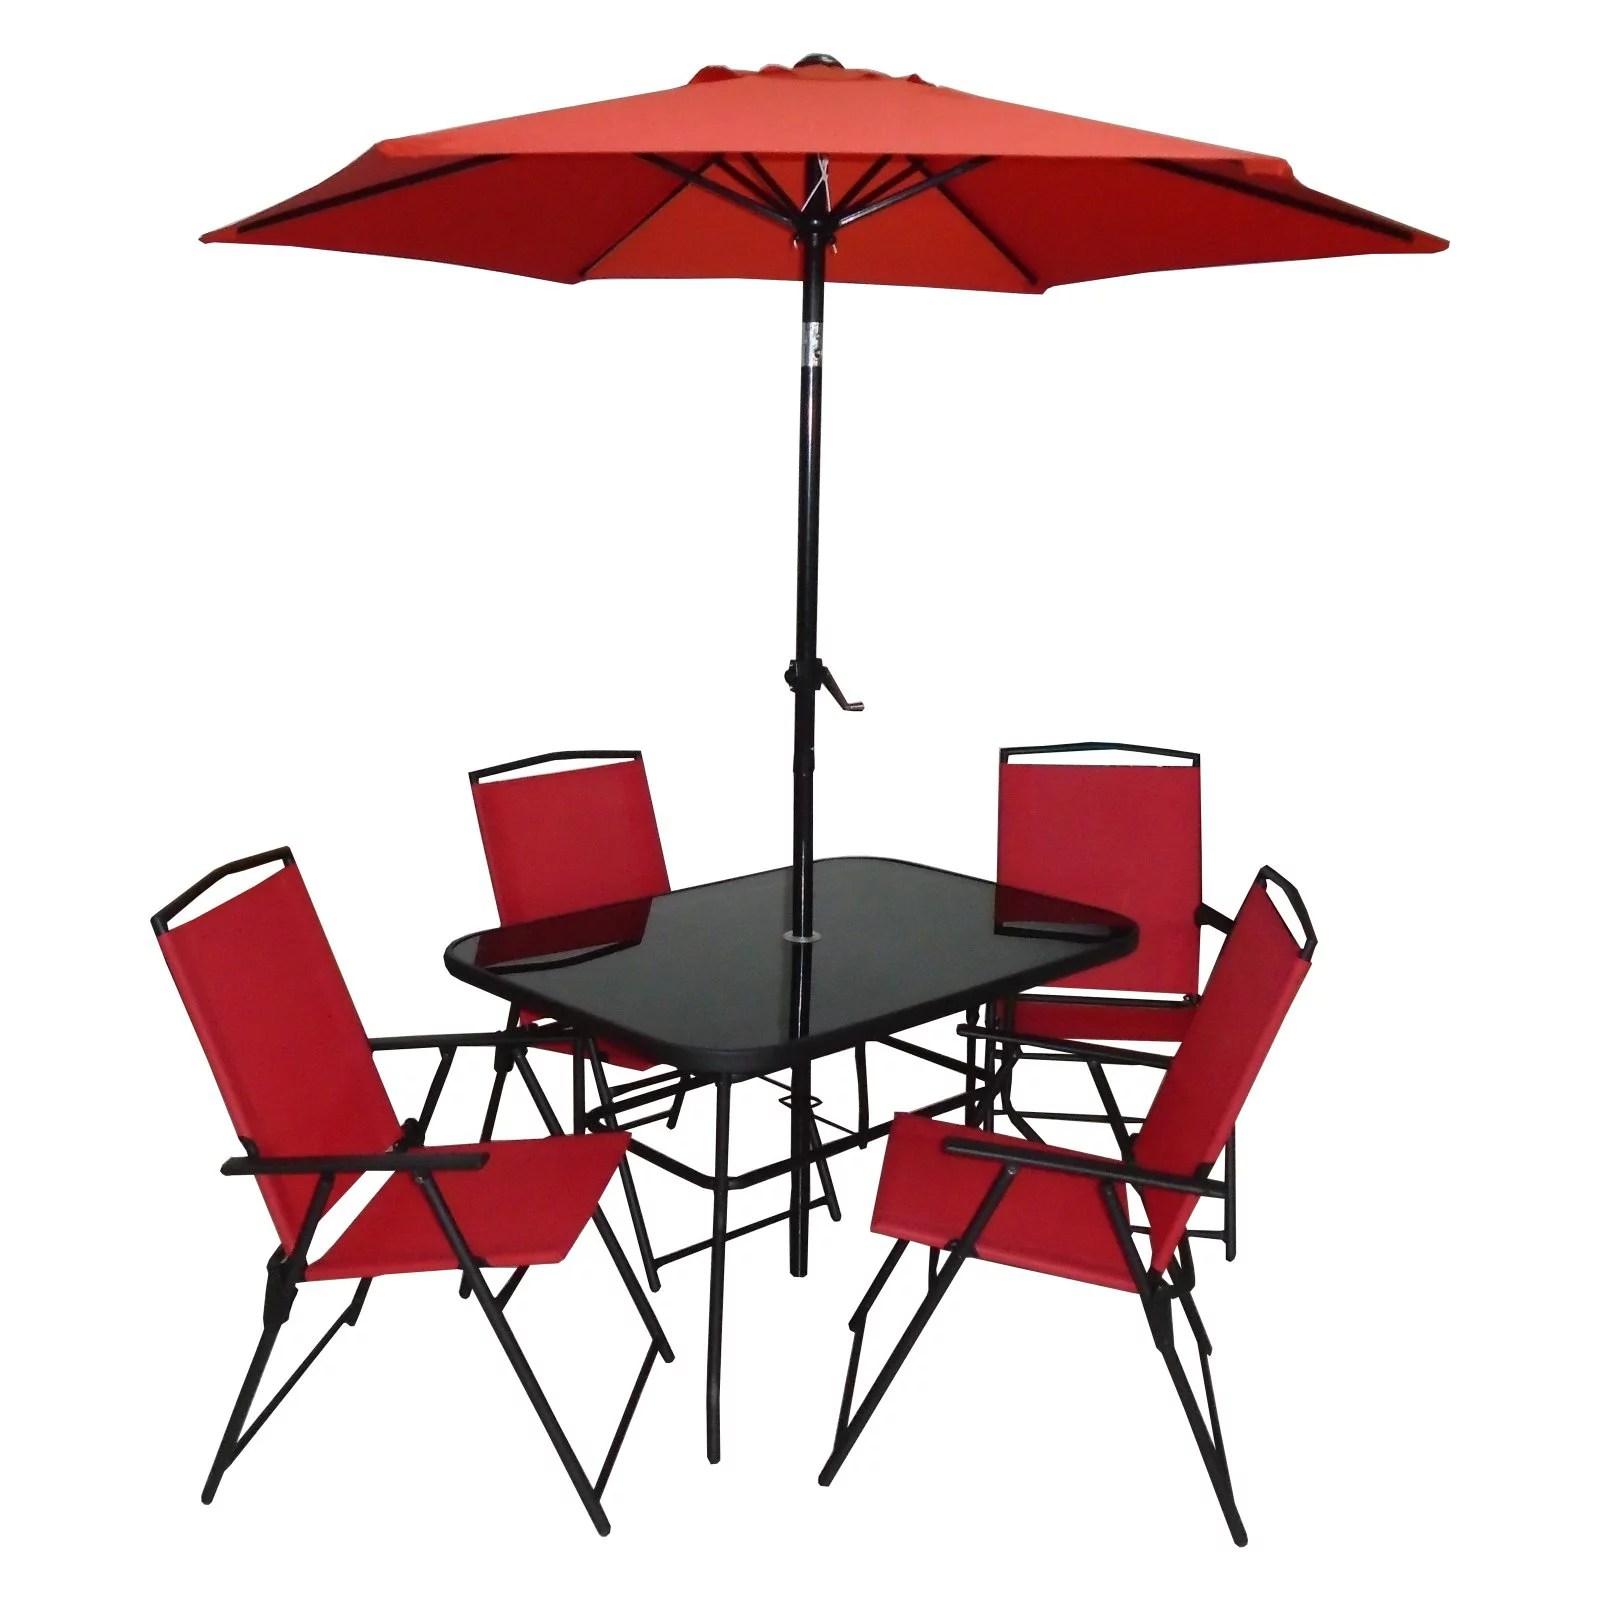 dura housewares pompeii 6 piece patio sling dining set with umbrella